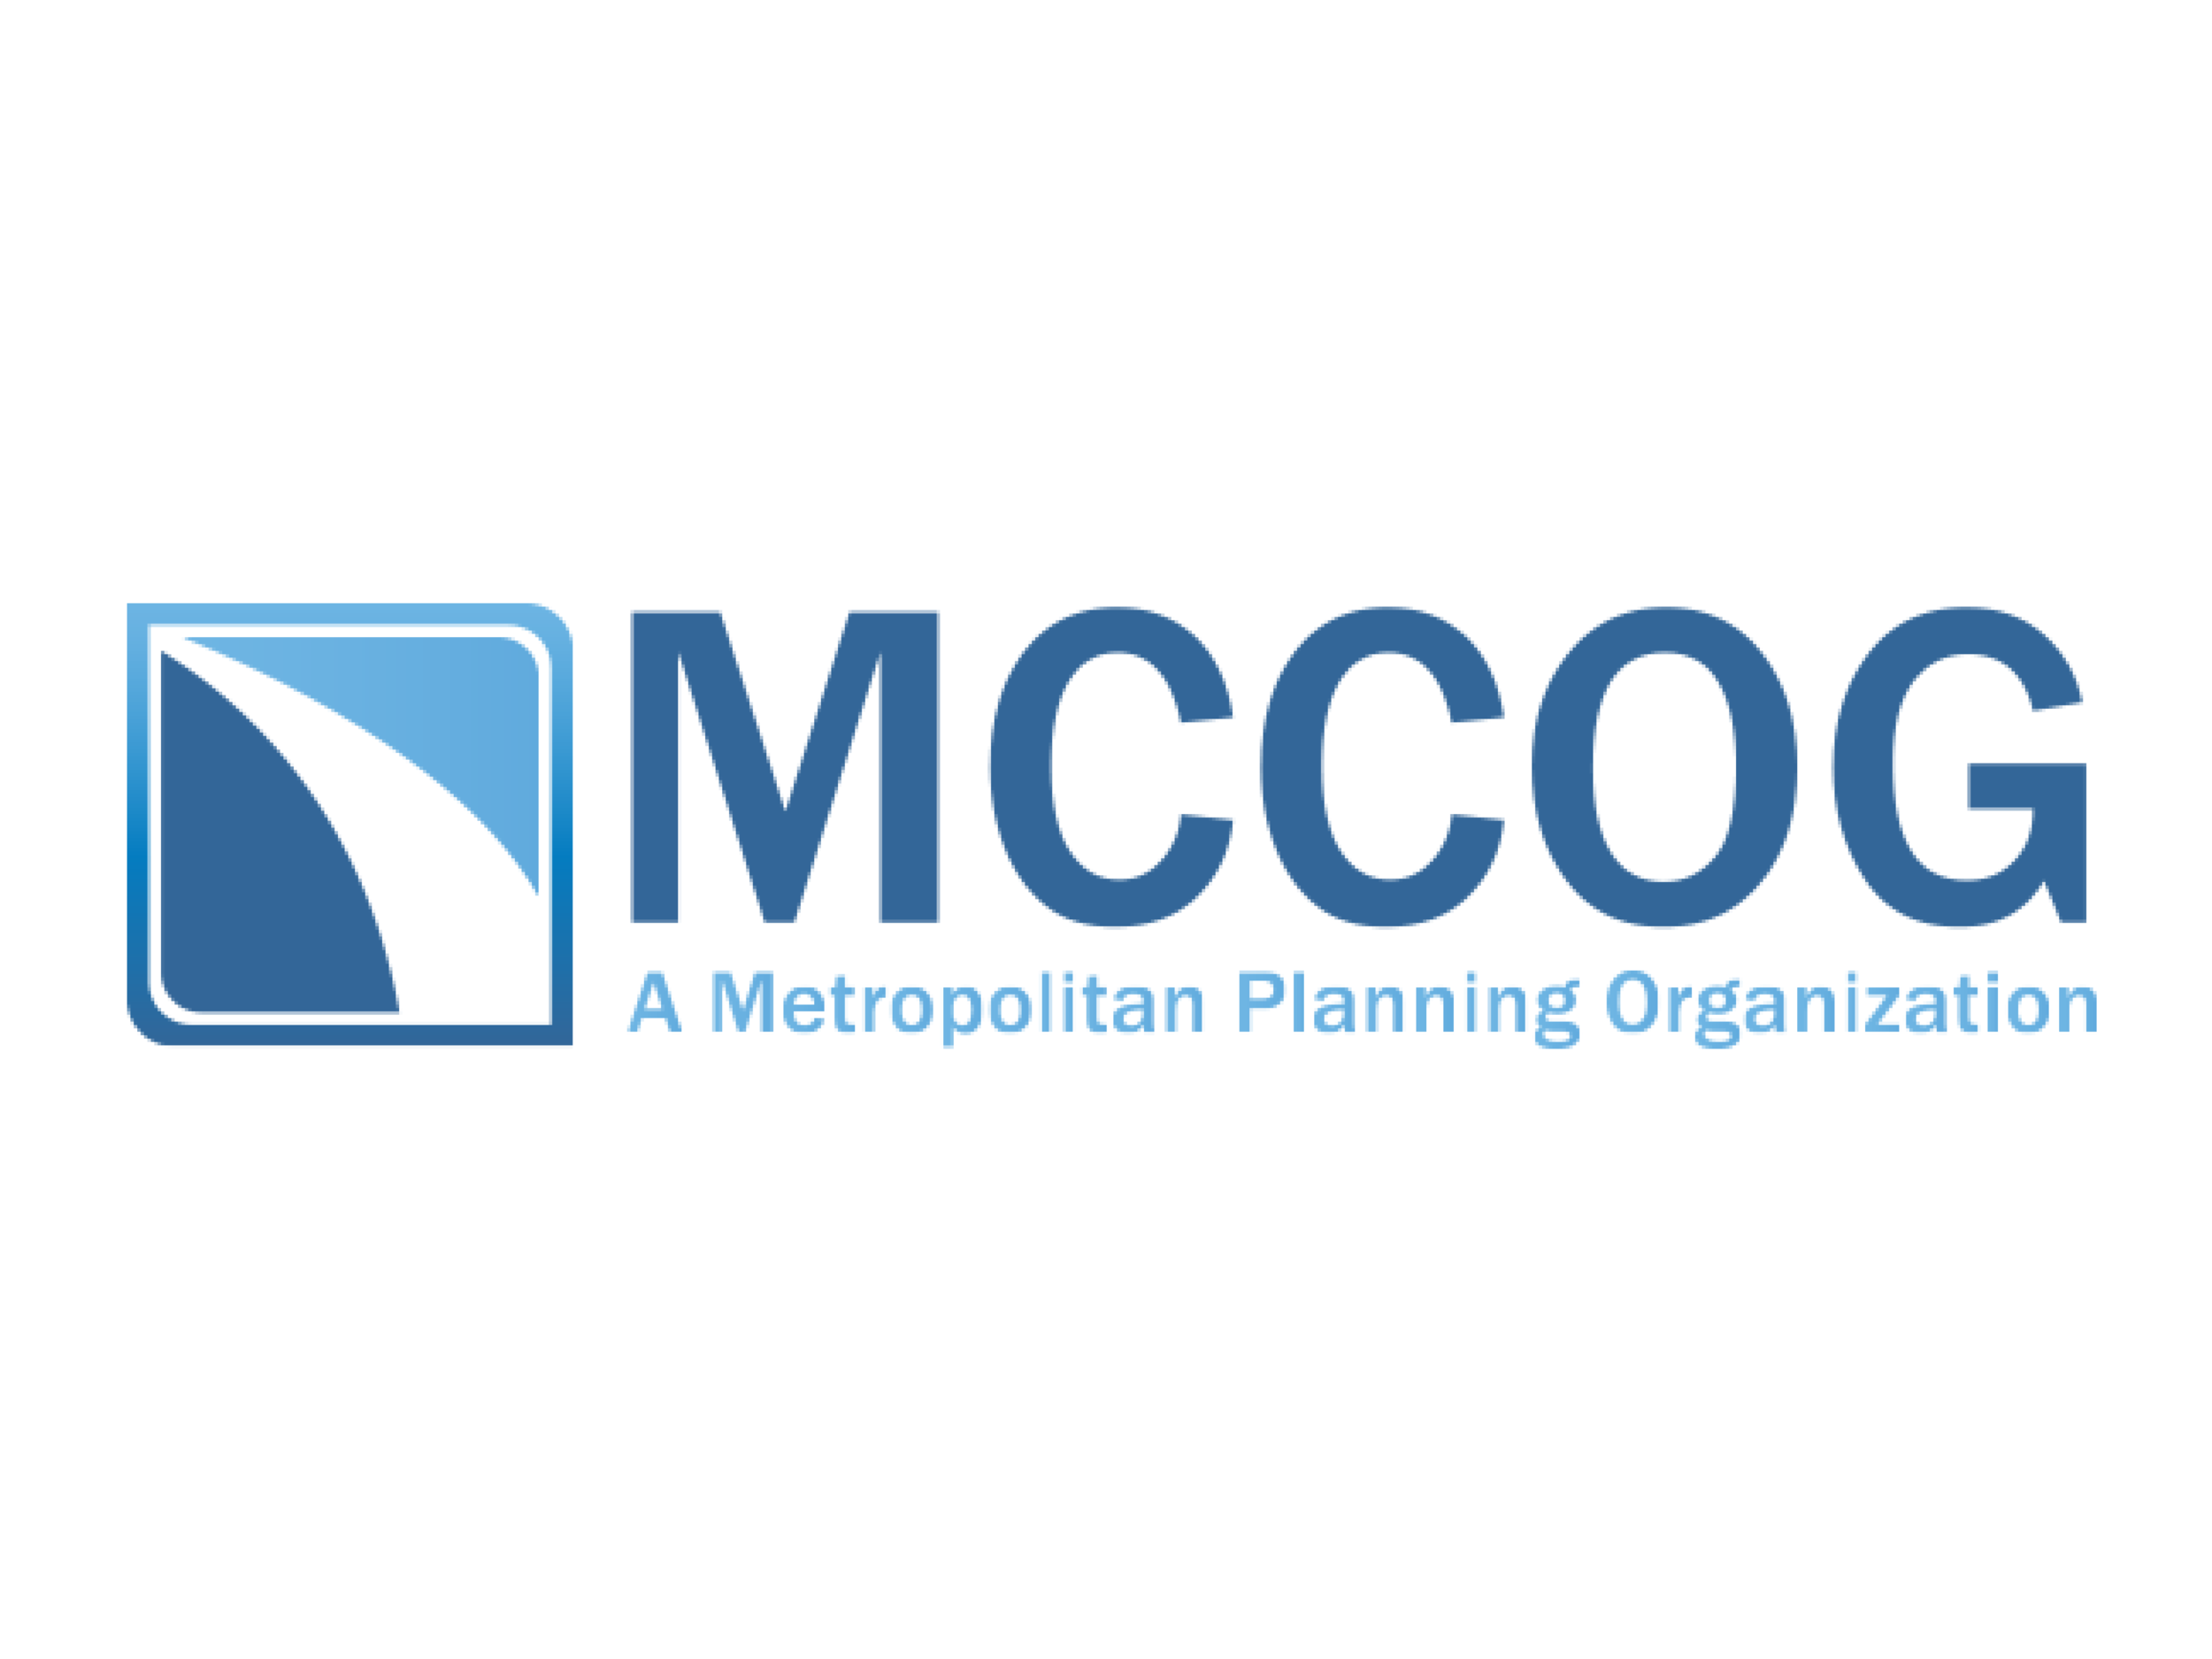 MCCOG.png